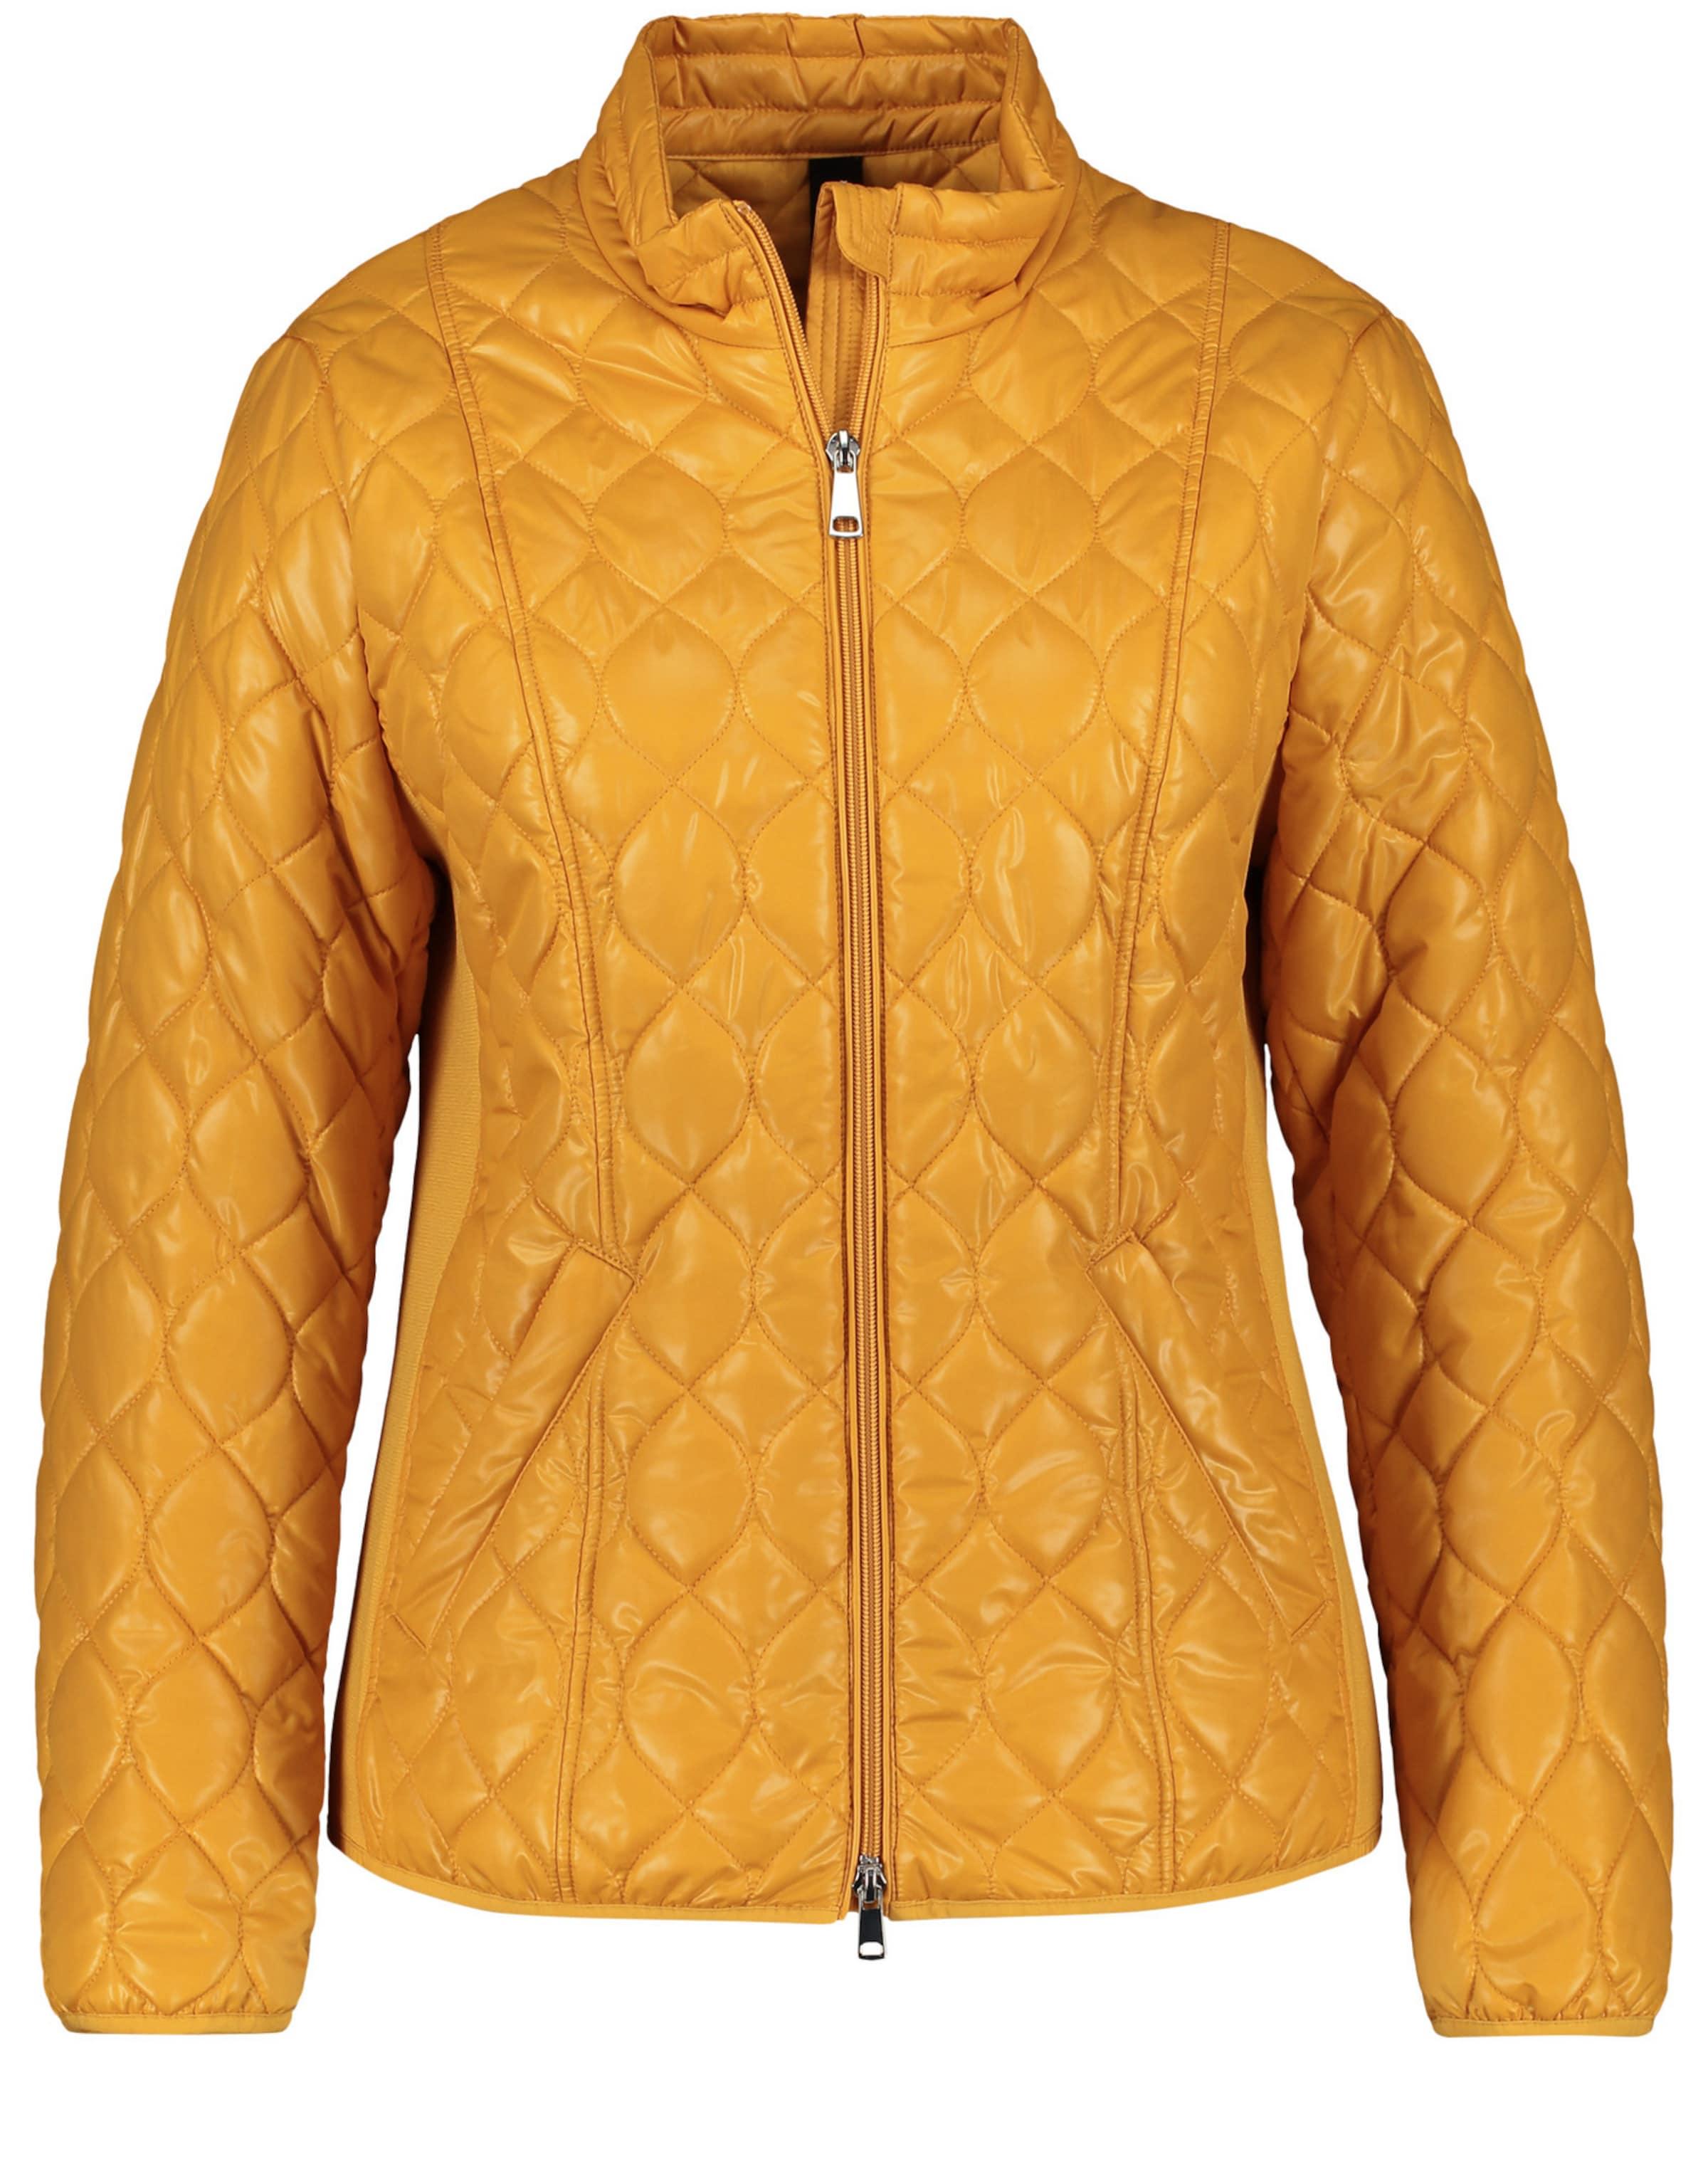 SAMOON Jacke in orange